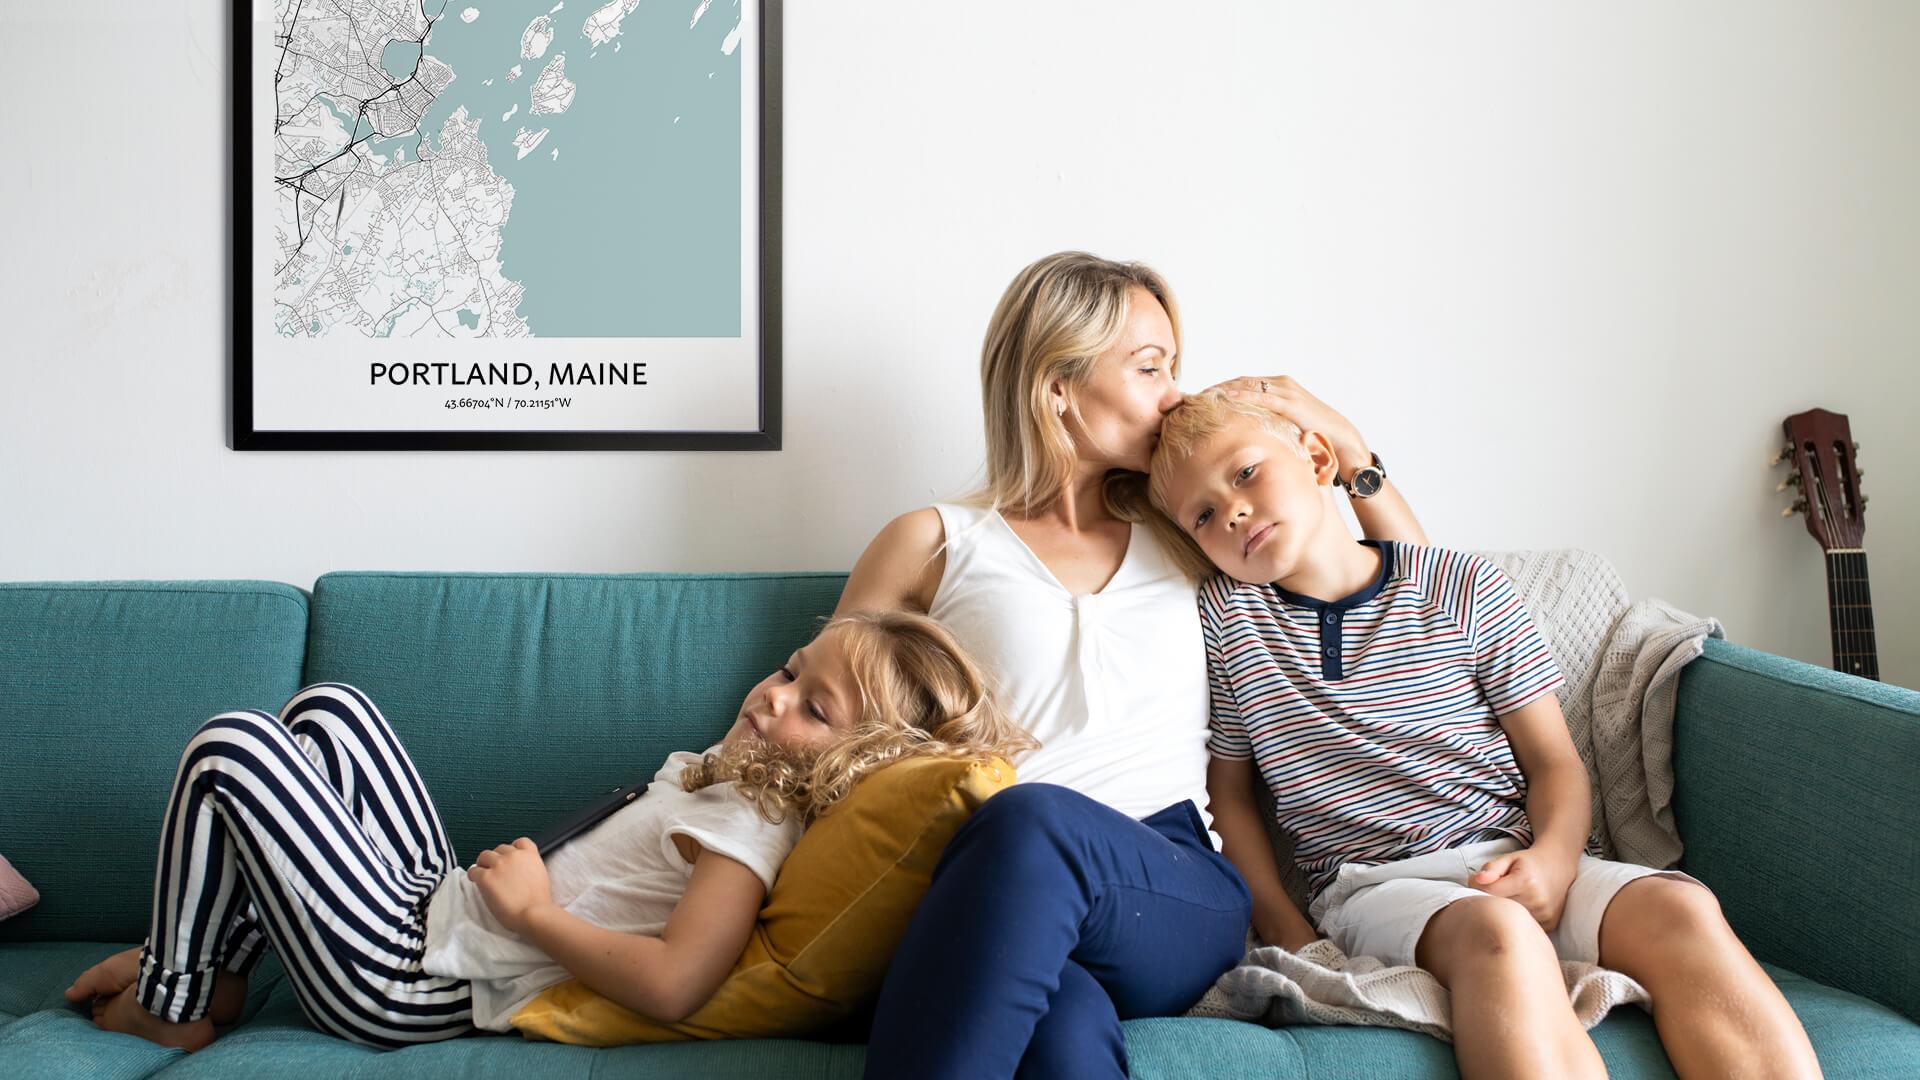 Portland map poster